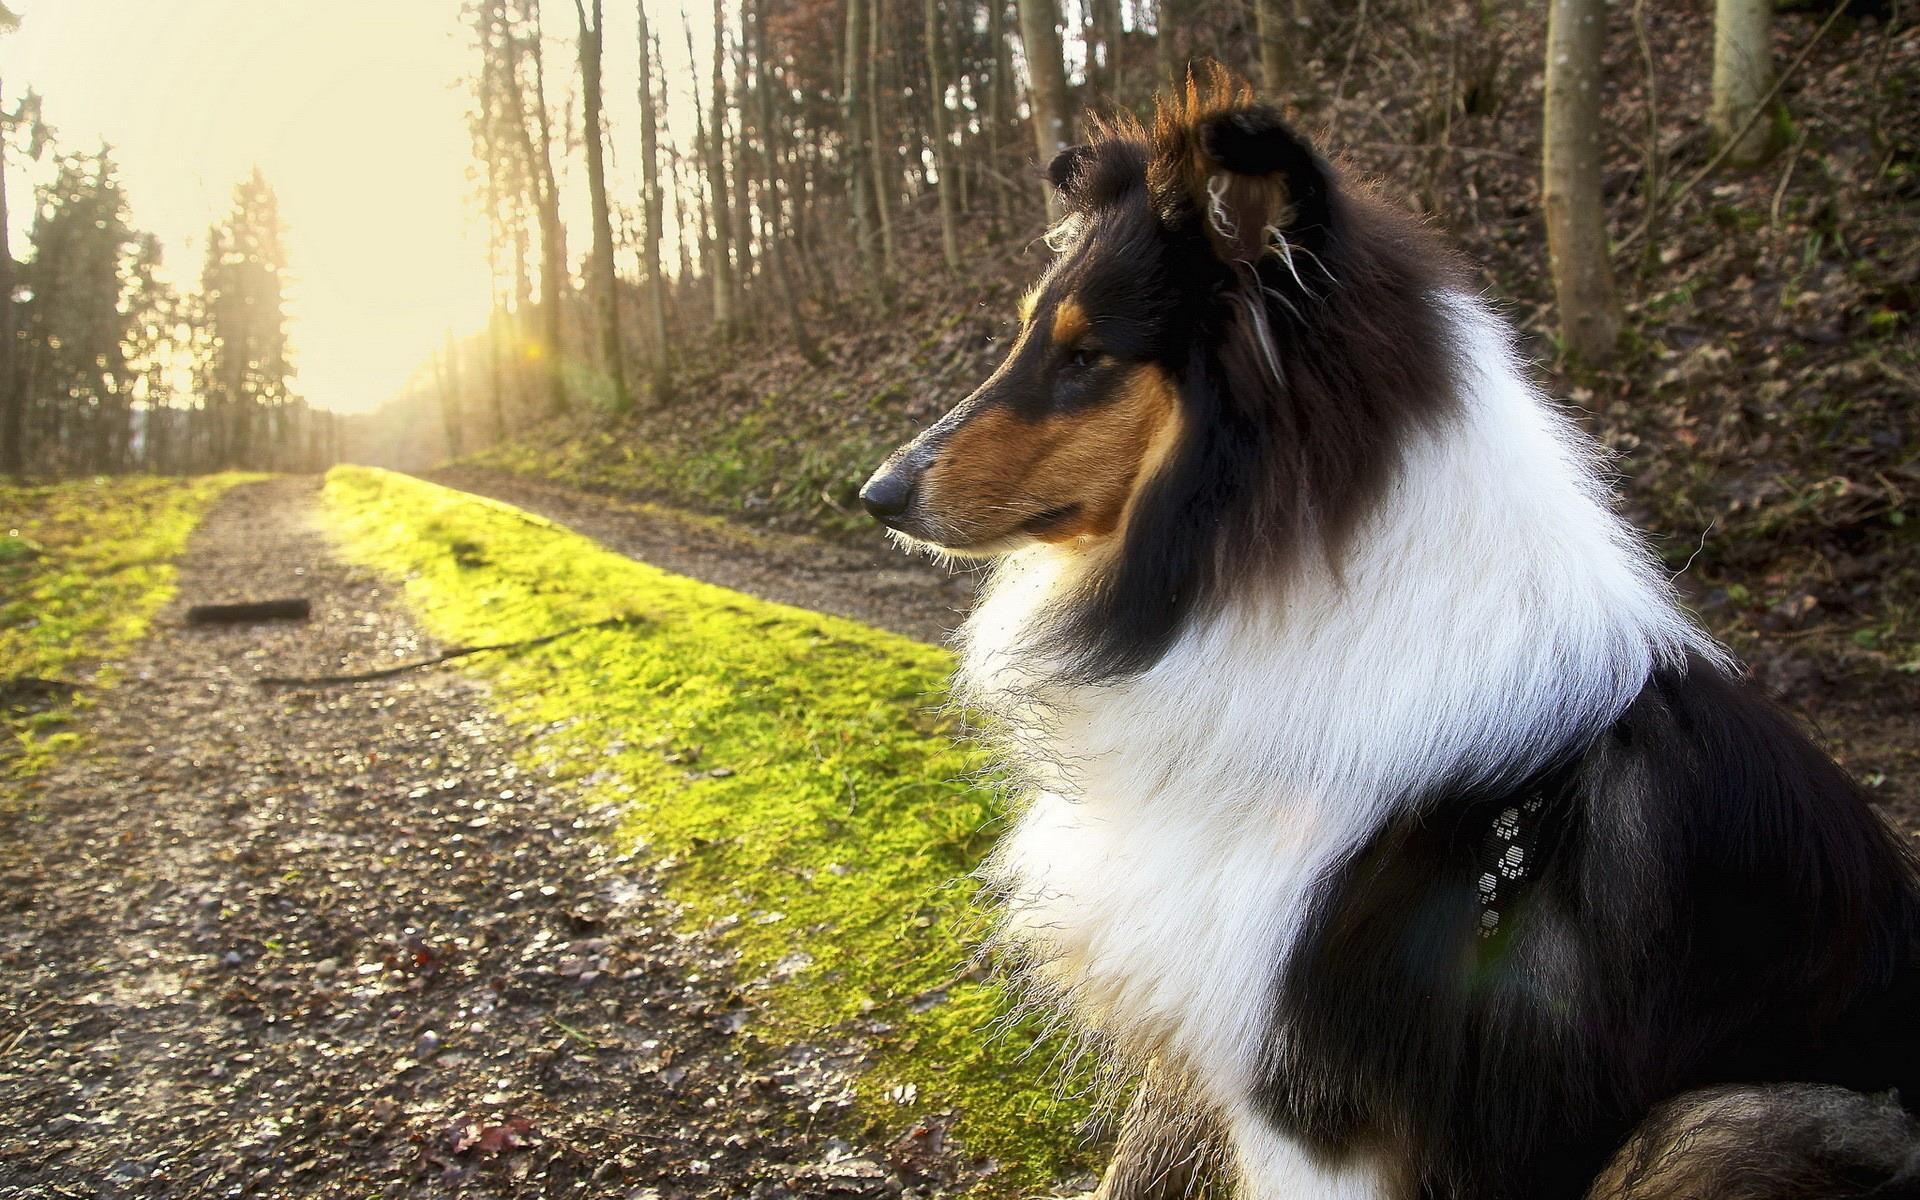 colley_animaux-domestiques_grand_format-du-jour_11